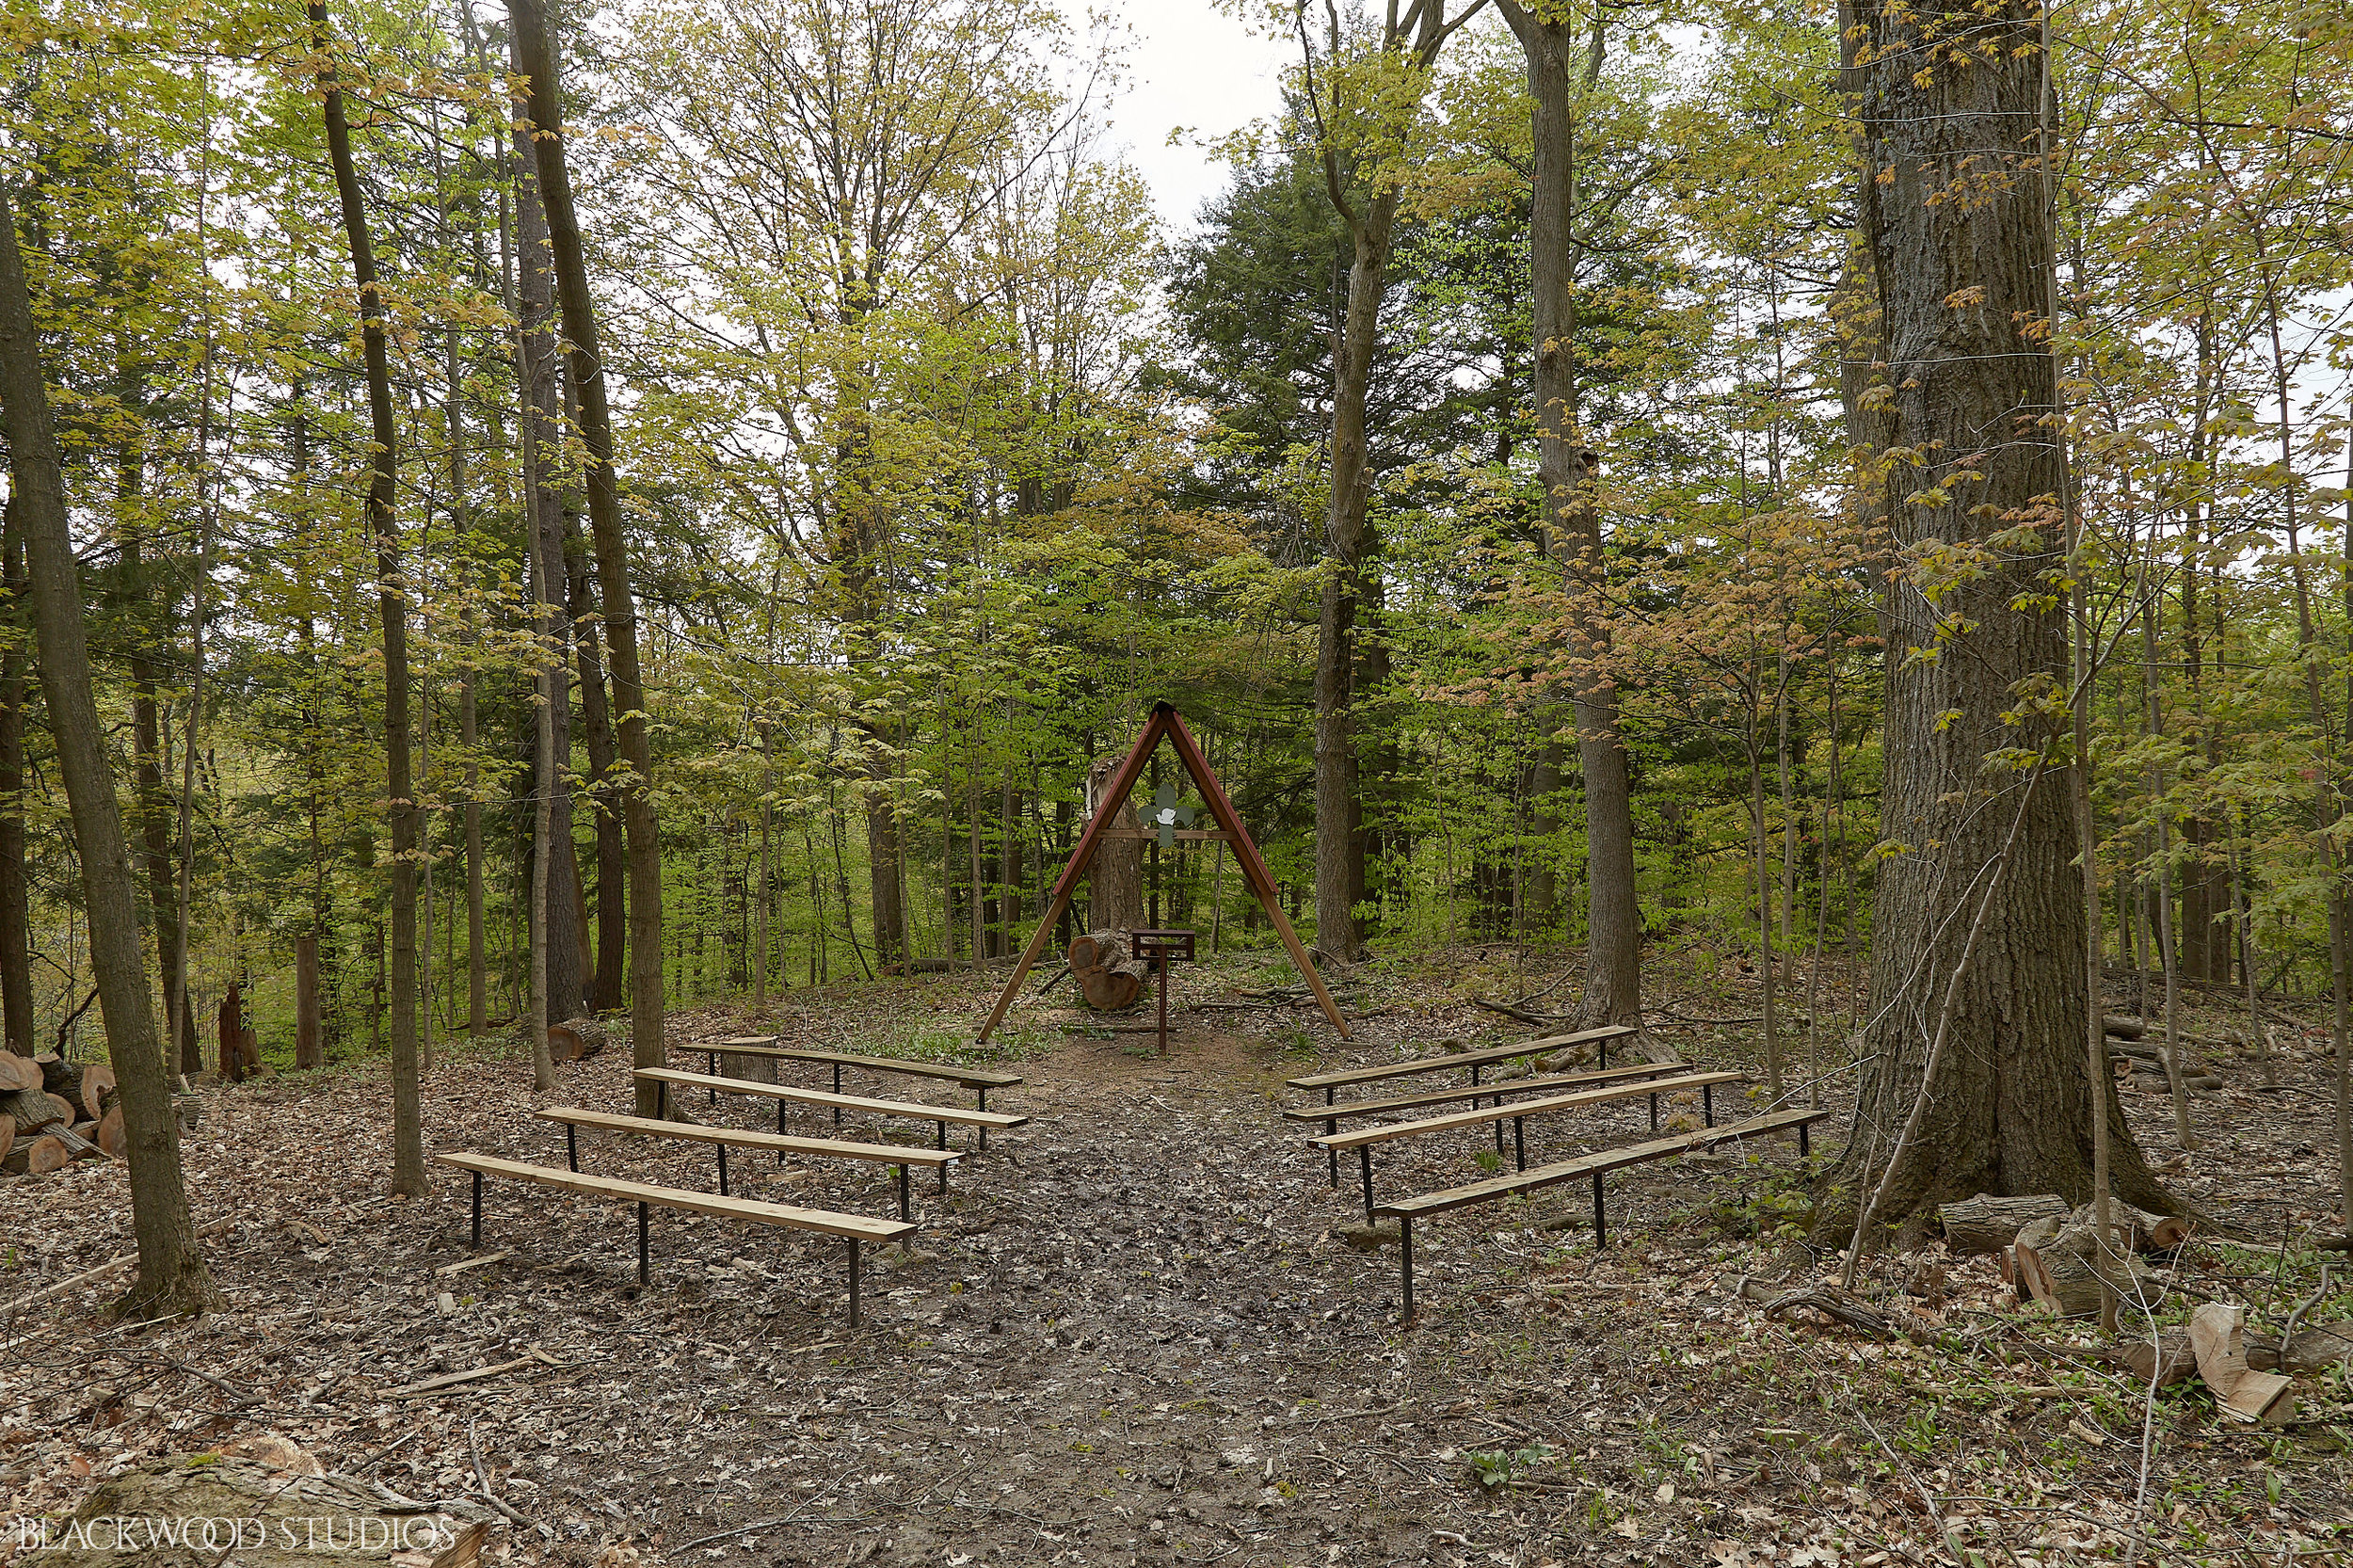 Blackwood-Studios-Photography-20190519155822-David-Kalin-Engagement-Session-Mount-Nemo-Scout-Camp-Burlington-Ontario-Canada.jpg